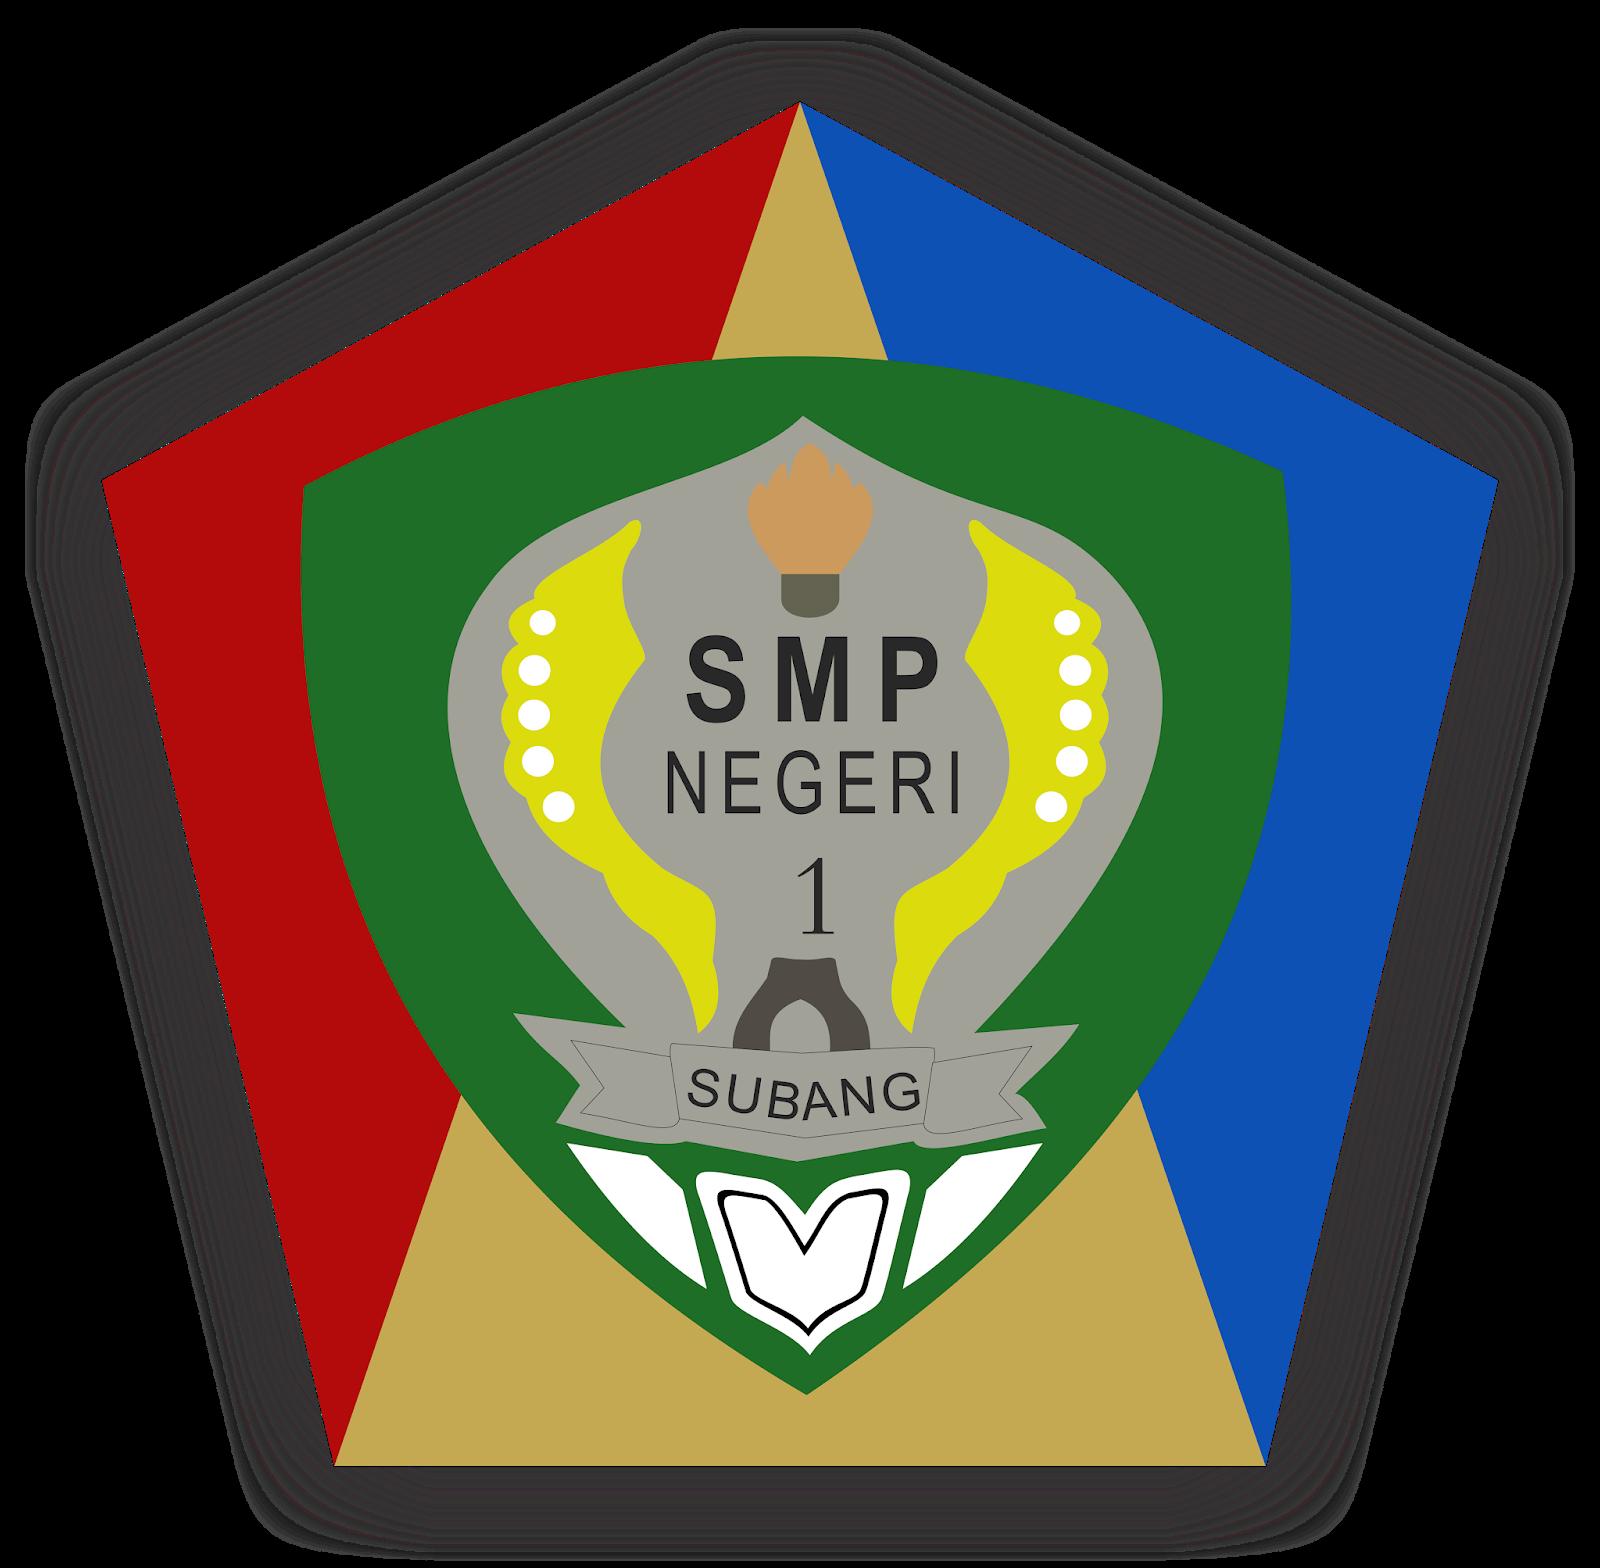 SMPN 1 SUBANG